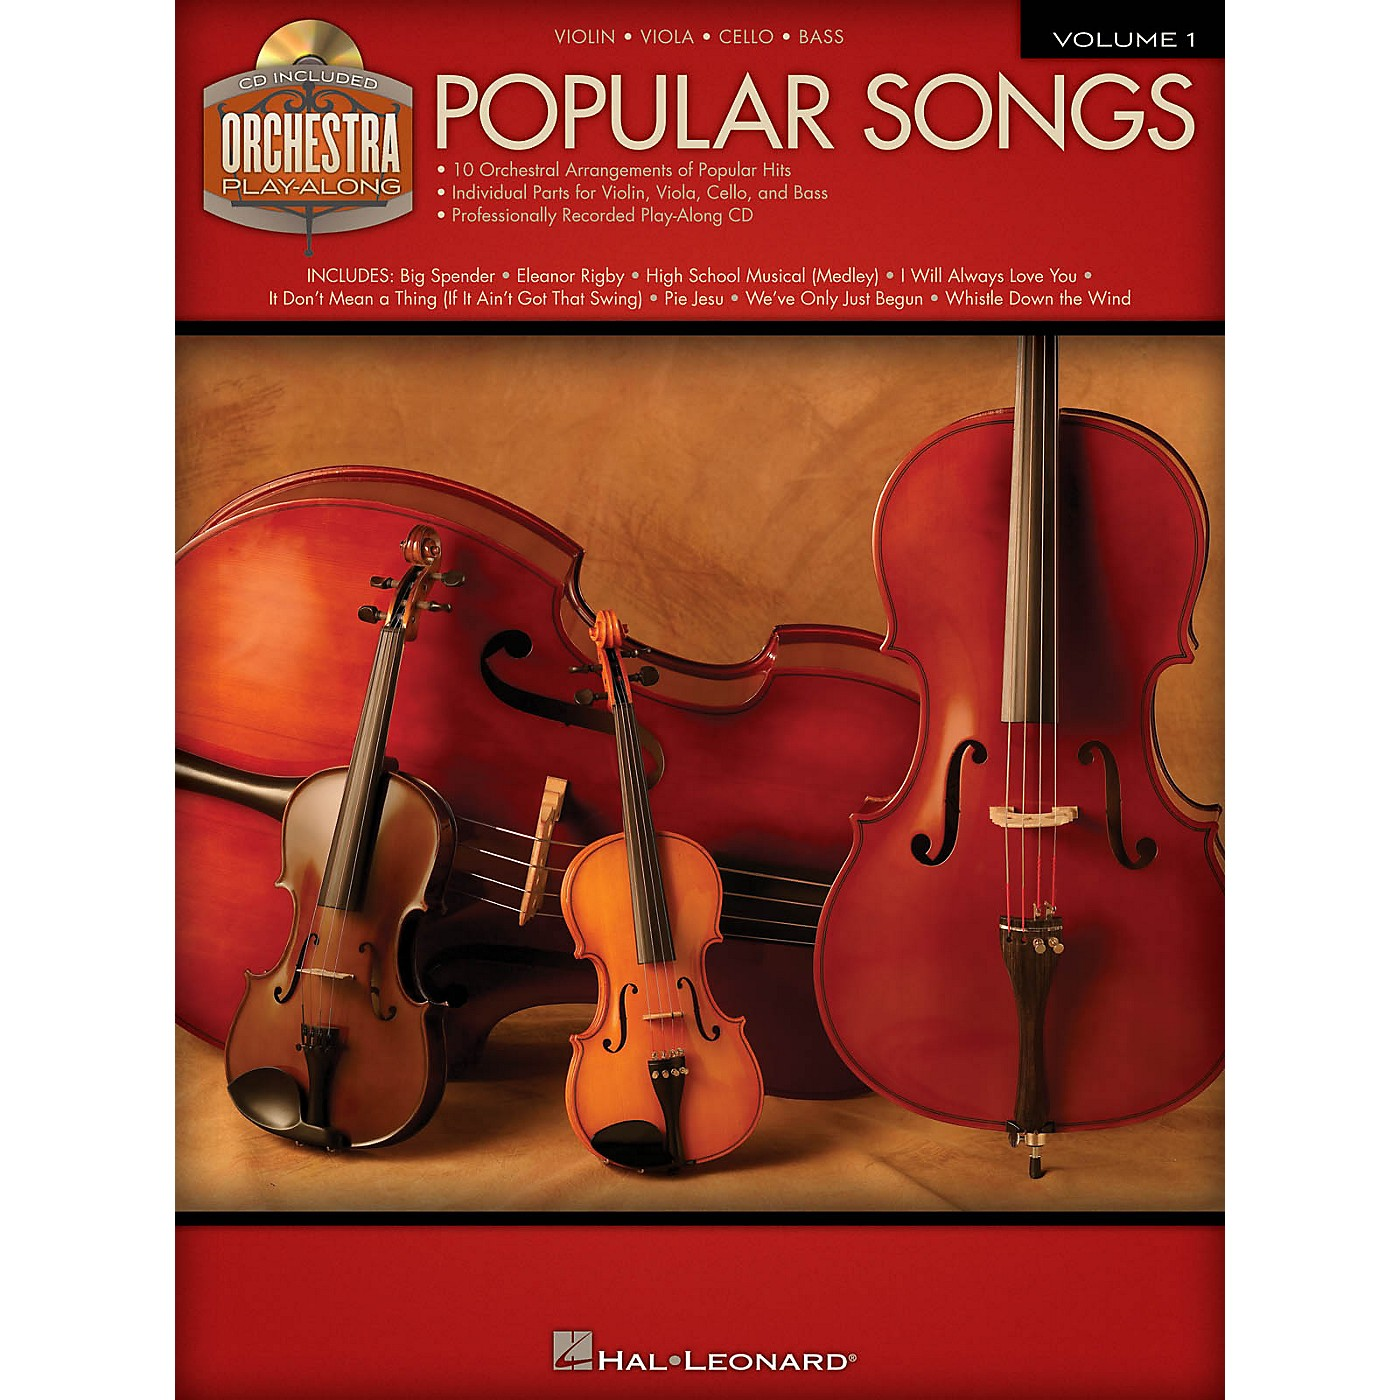 Hal Leonard Popular Songs (Orchestra Play-Along Volume 1) Orchestra Play-Along Series Softcover with CD thumbnail